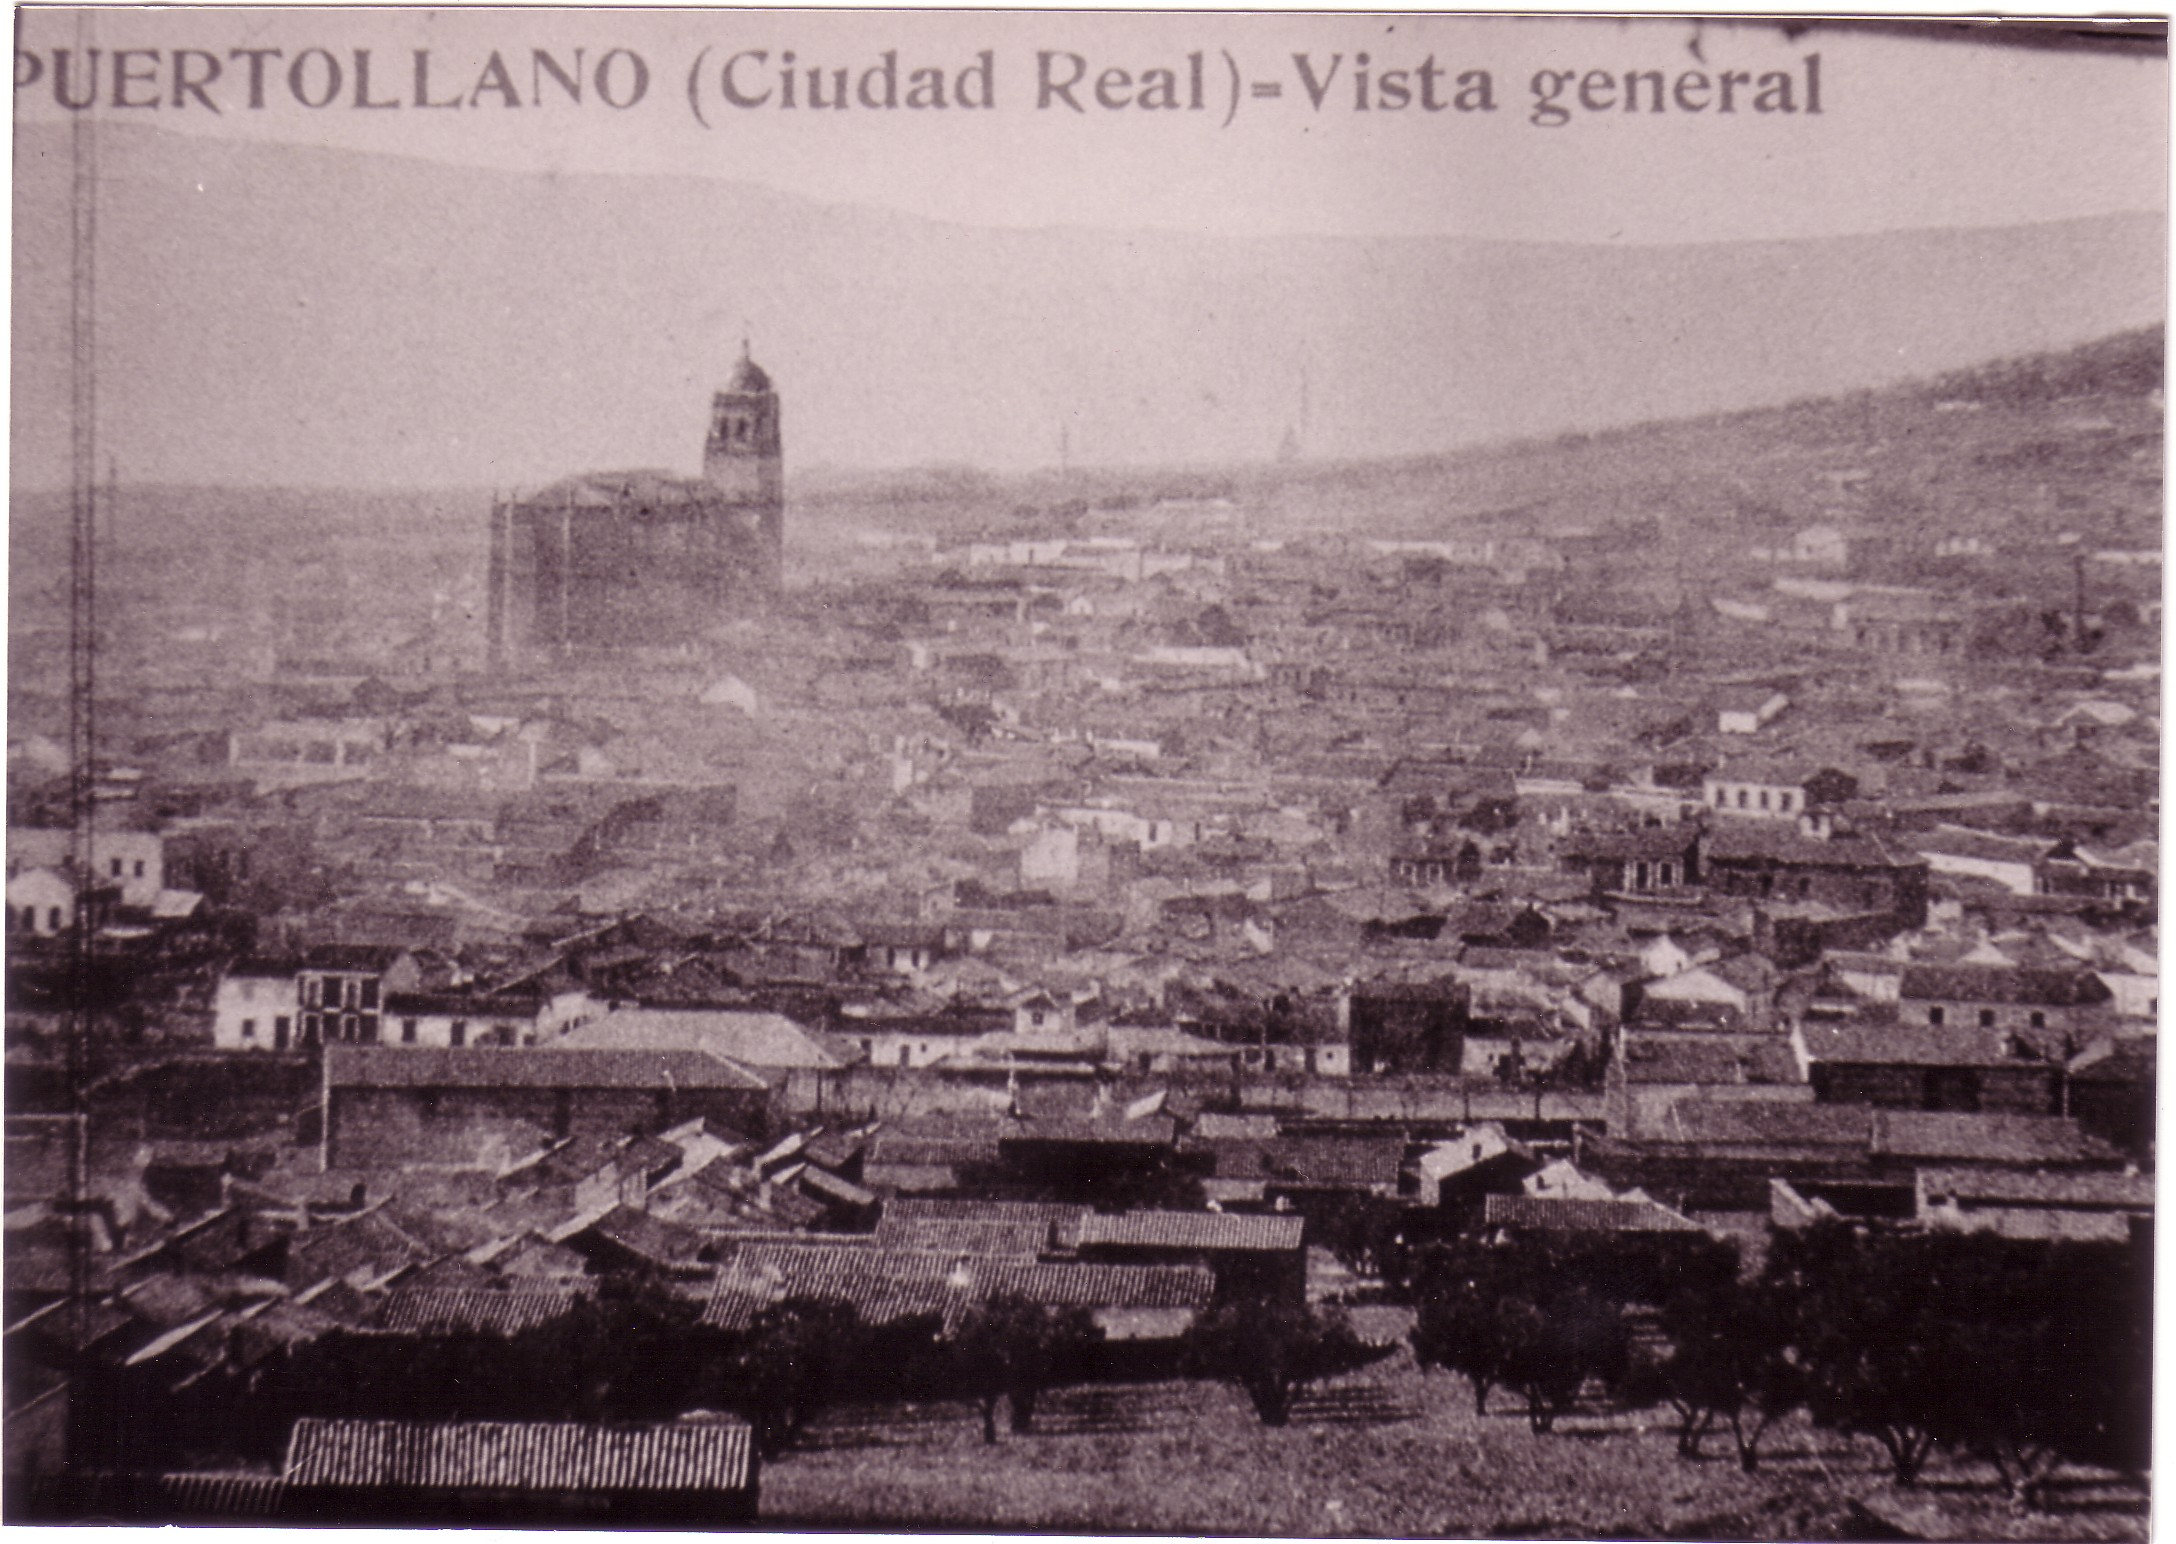 Vista General de Puertollano